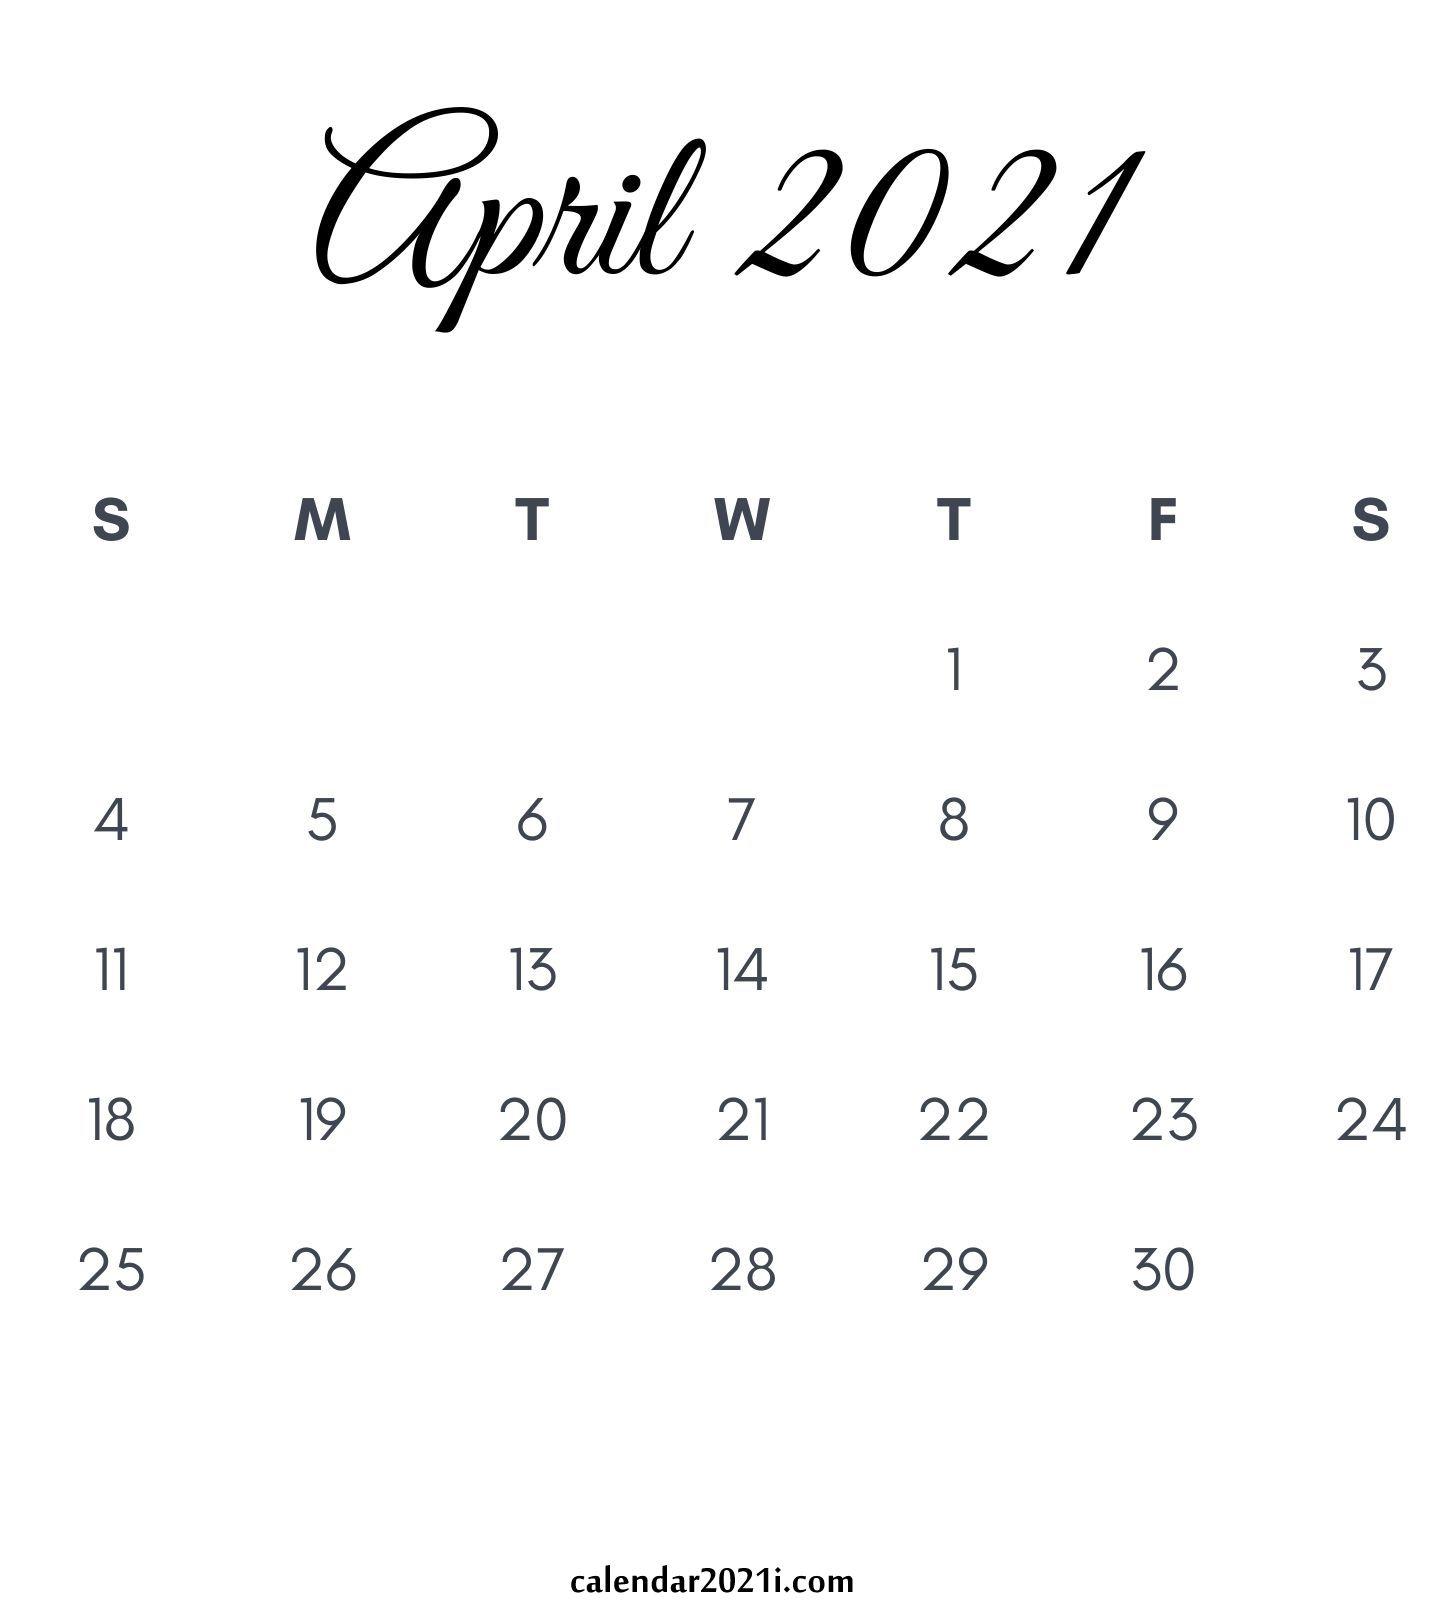 April 2021 Calendar Printable Floral Holidays Wallpaper 1450x1600